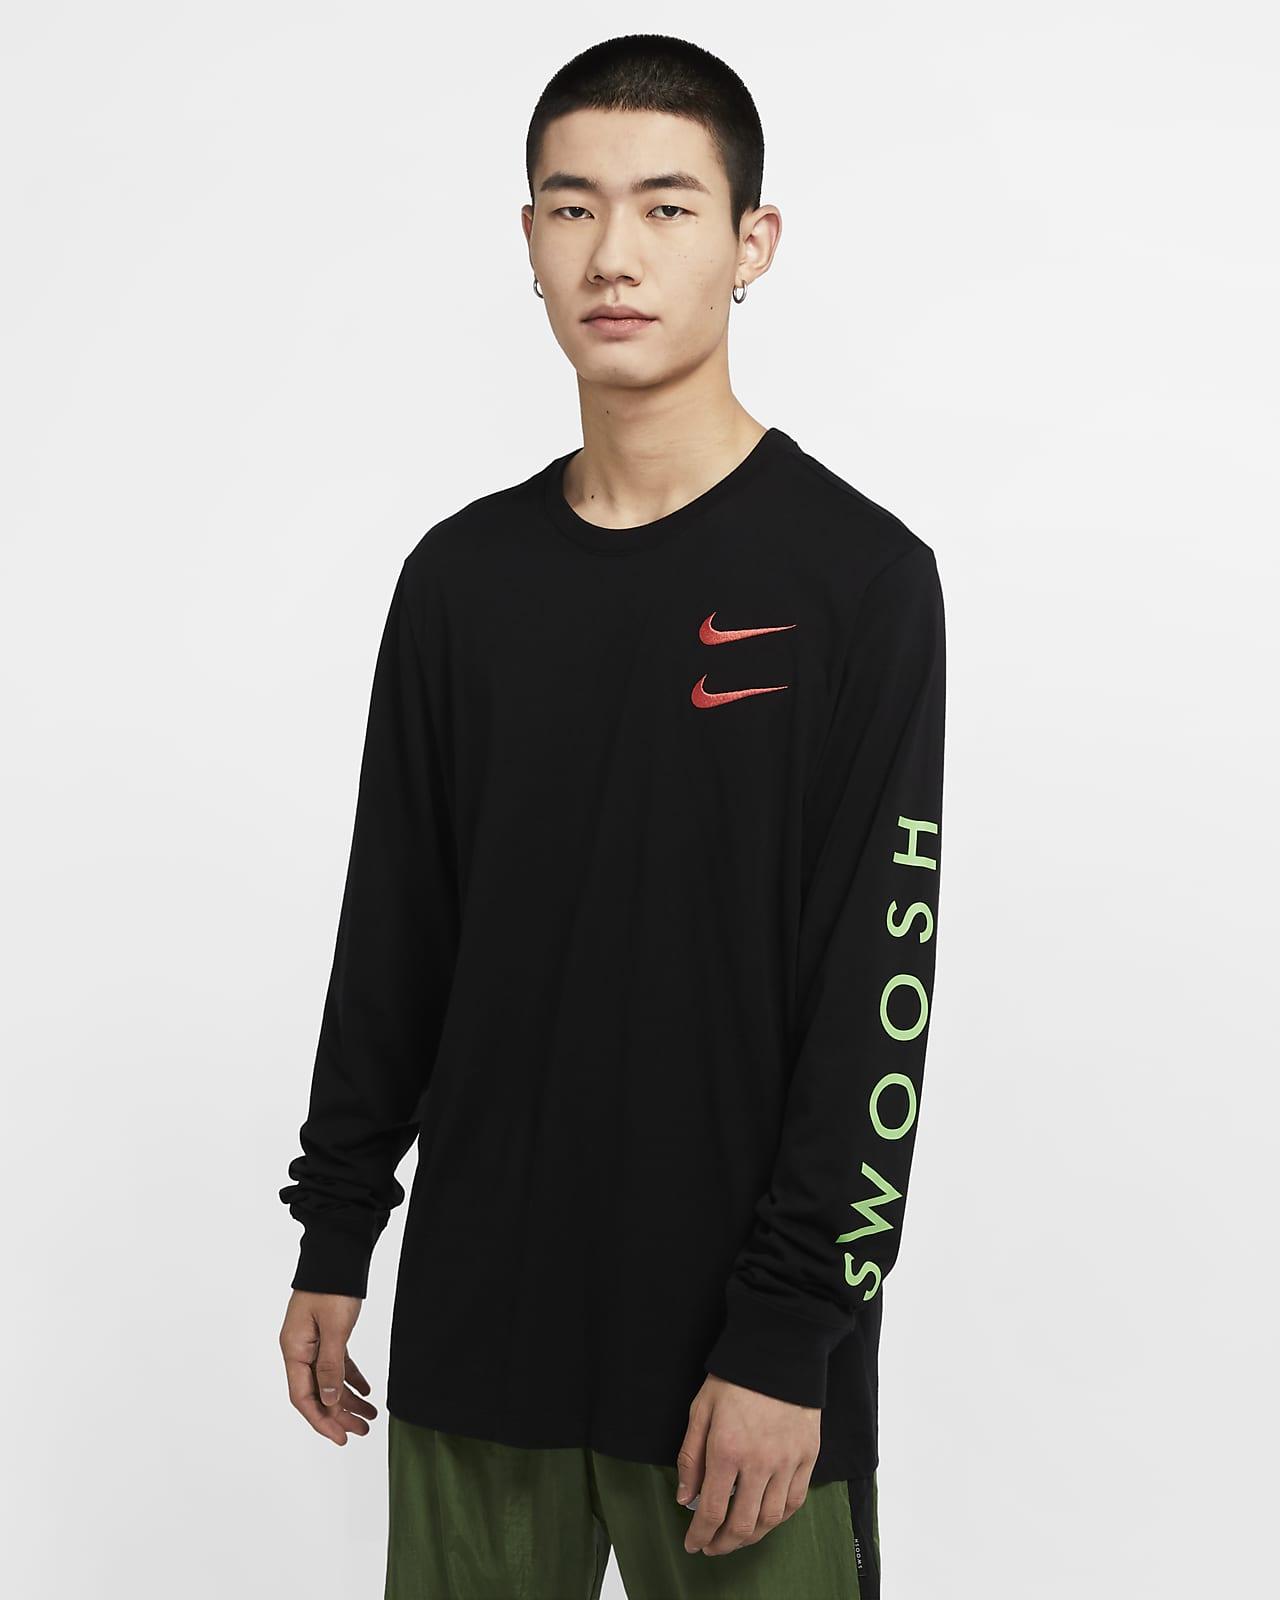 Långärmad t shirt Nike Sportswear för killar. Nike SE